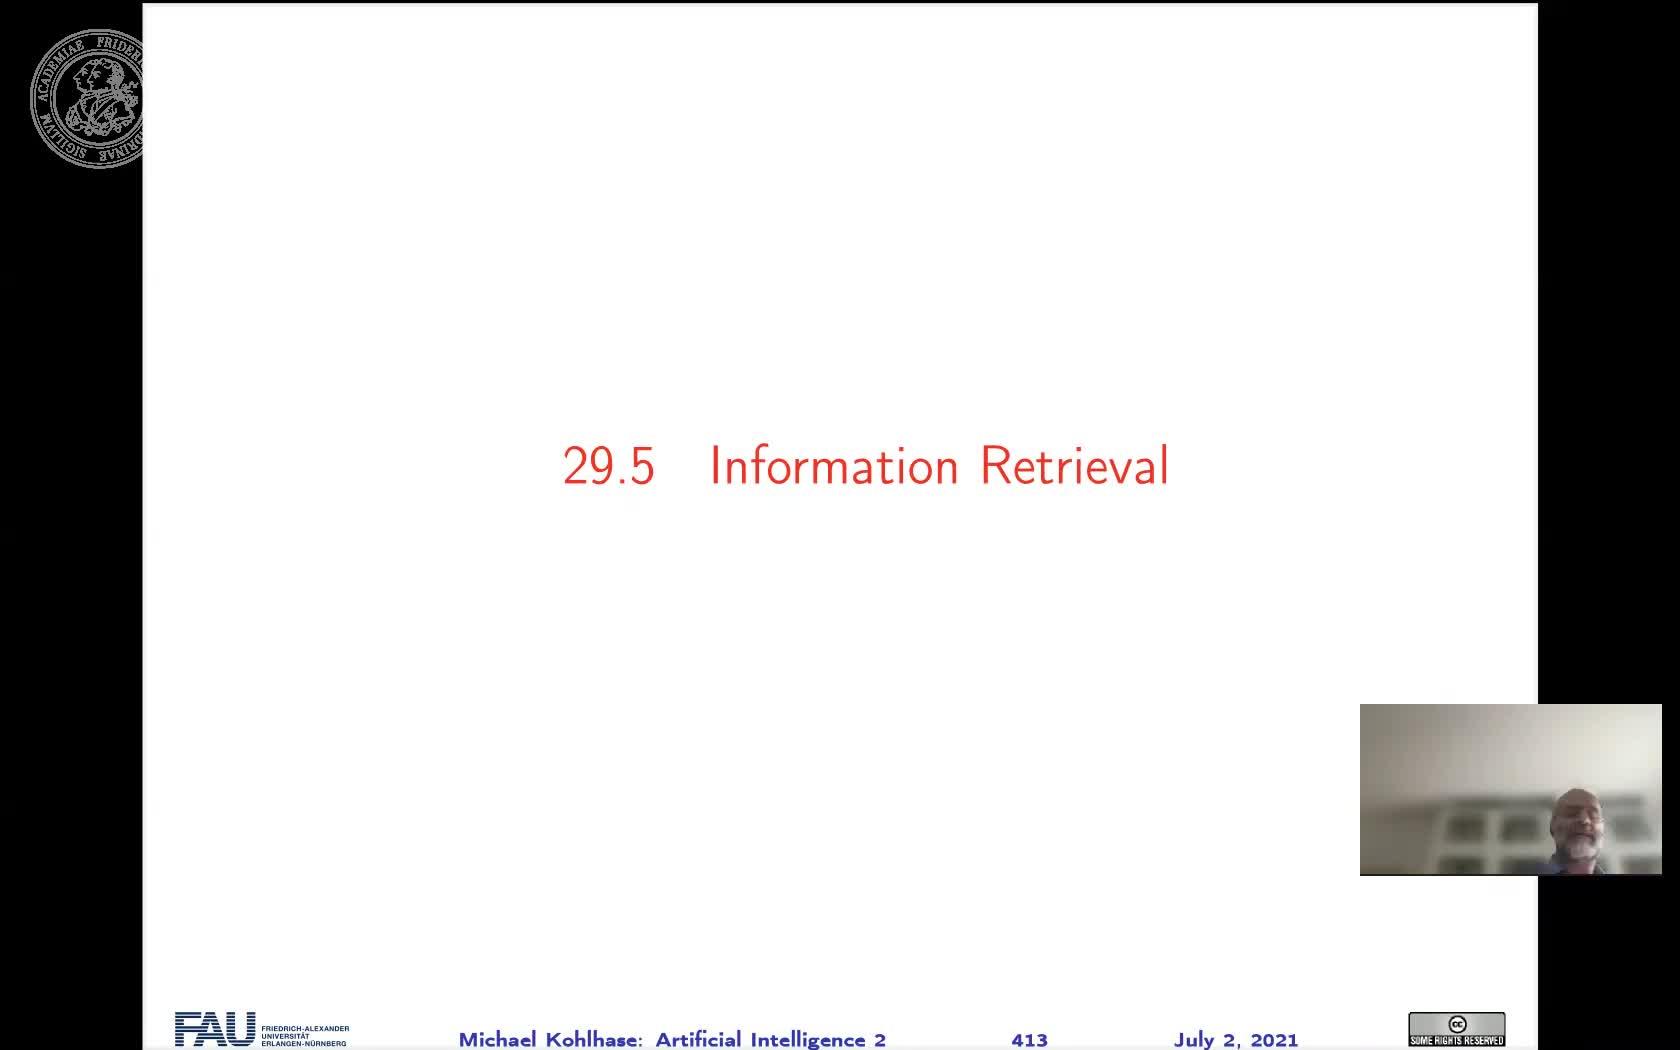 29.5 Information Retrieval preview image